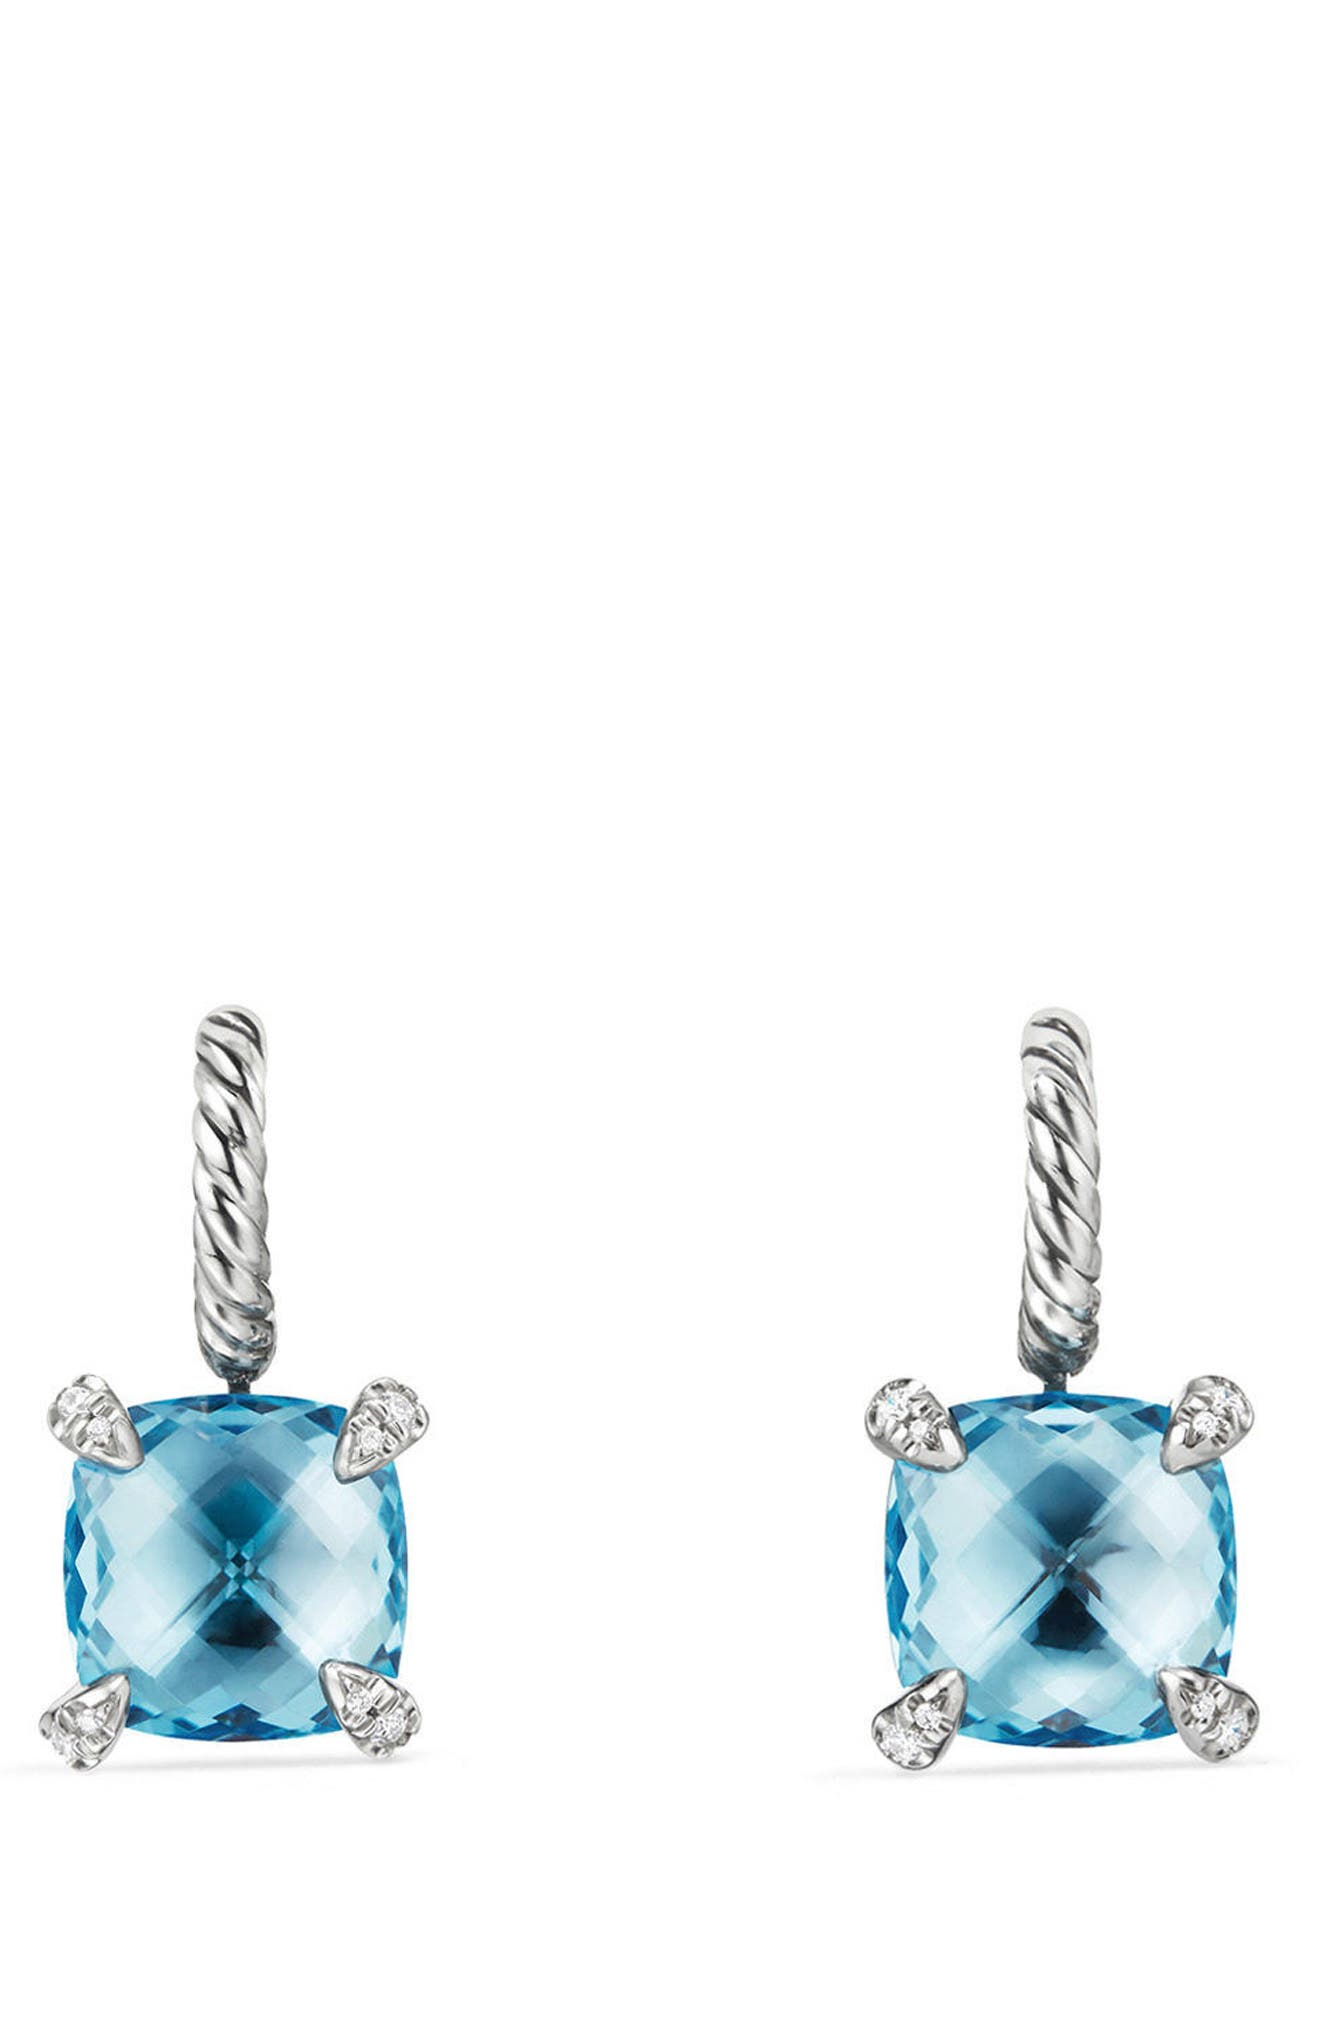 Main Image - David Yurman Châtelaine Drop Earrings with Diamonds